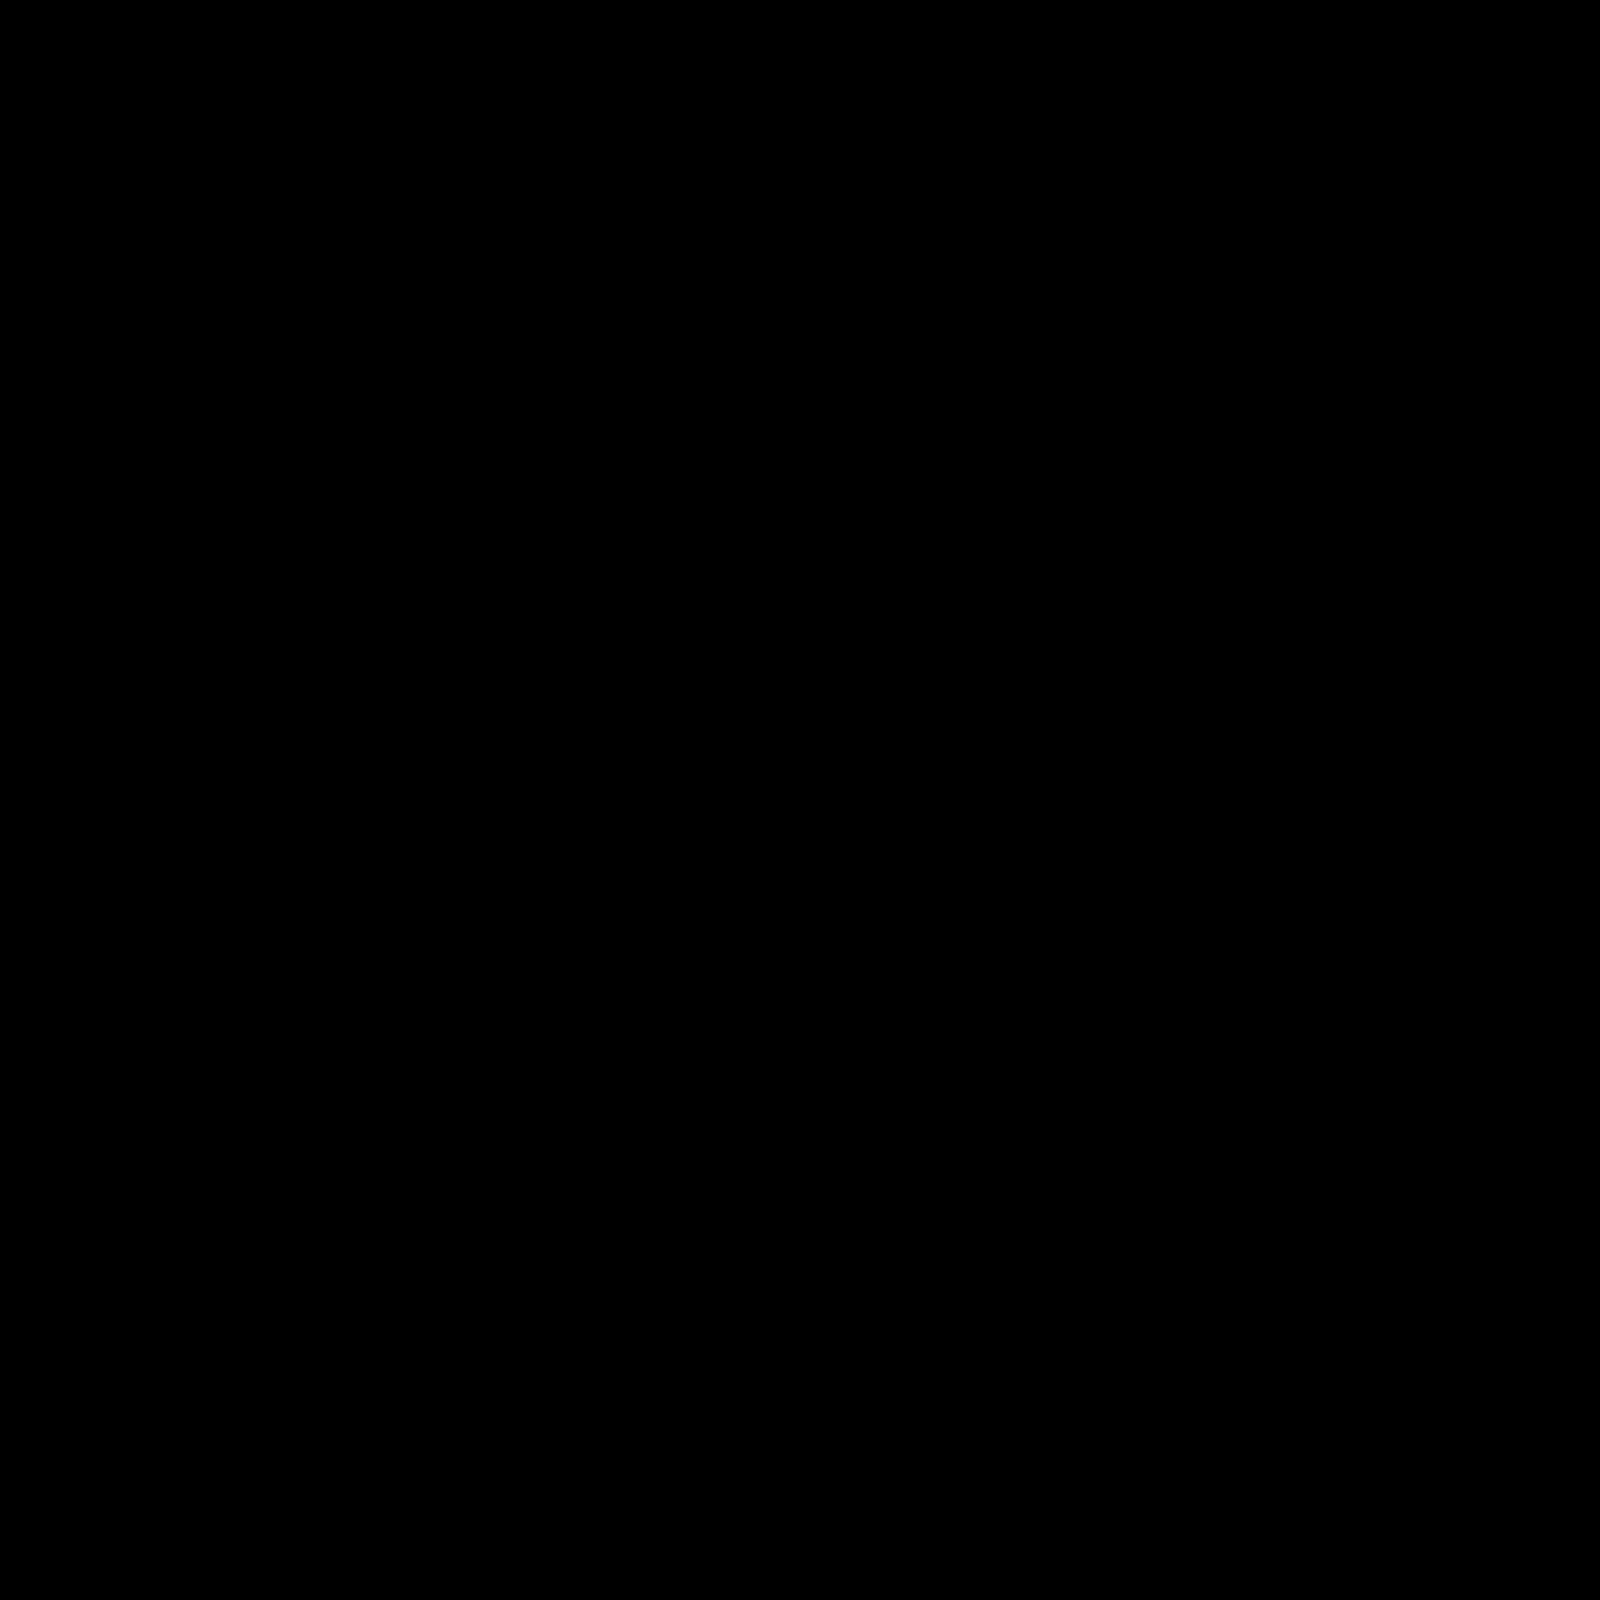 Bidet icon